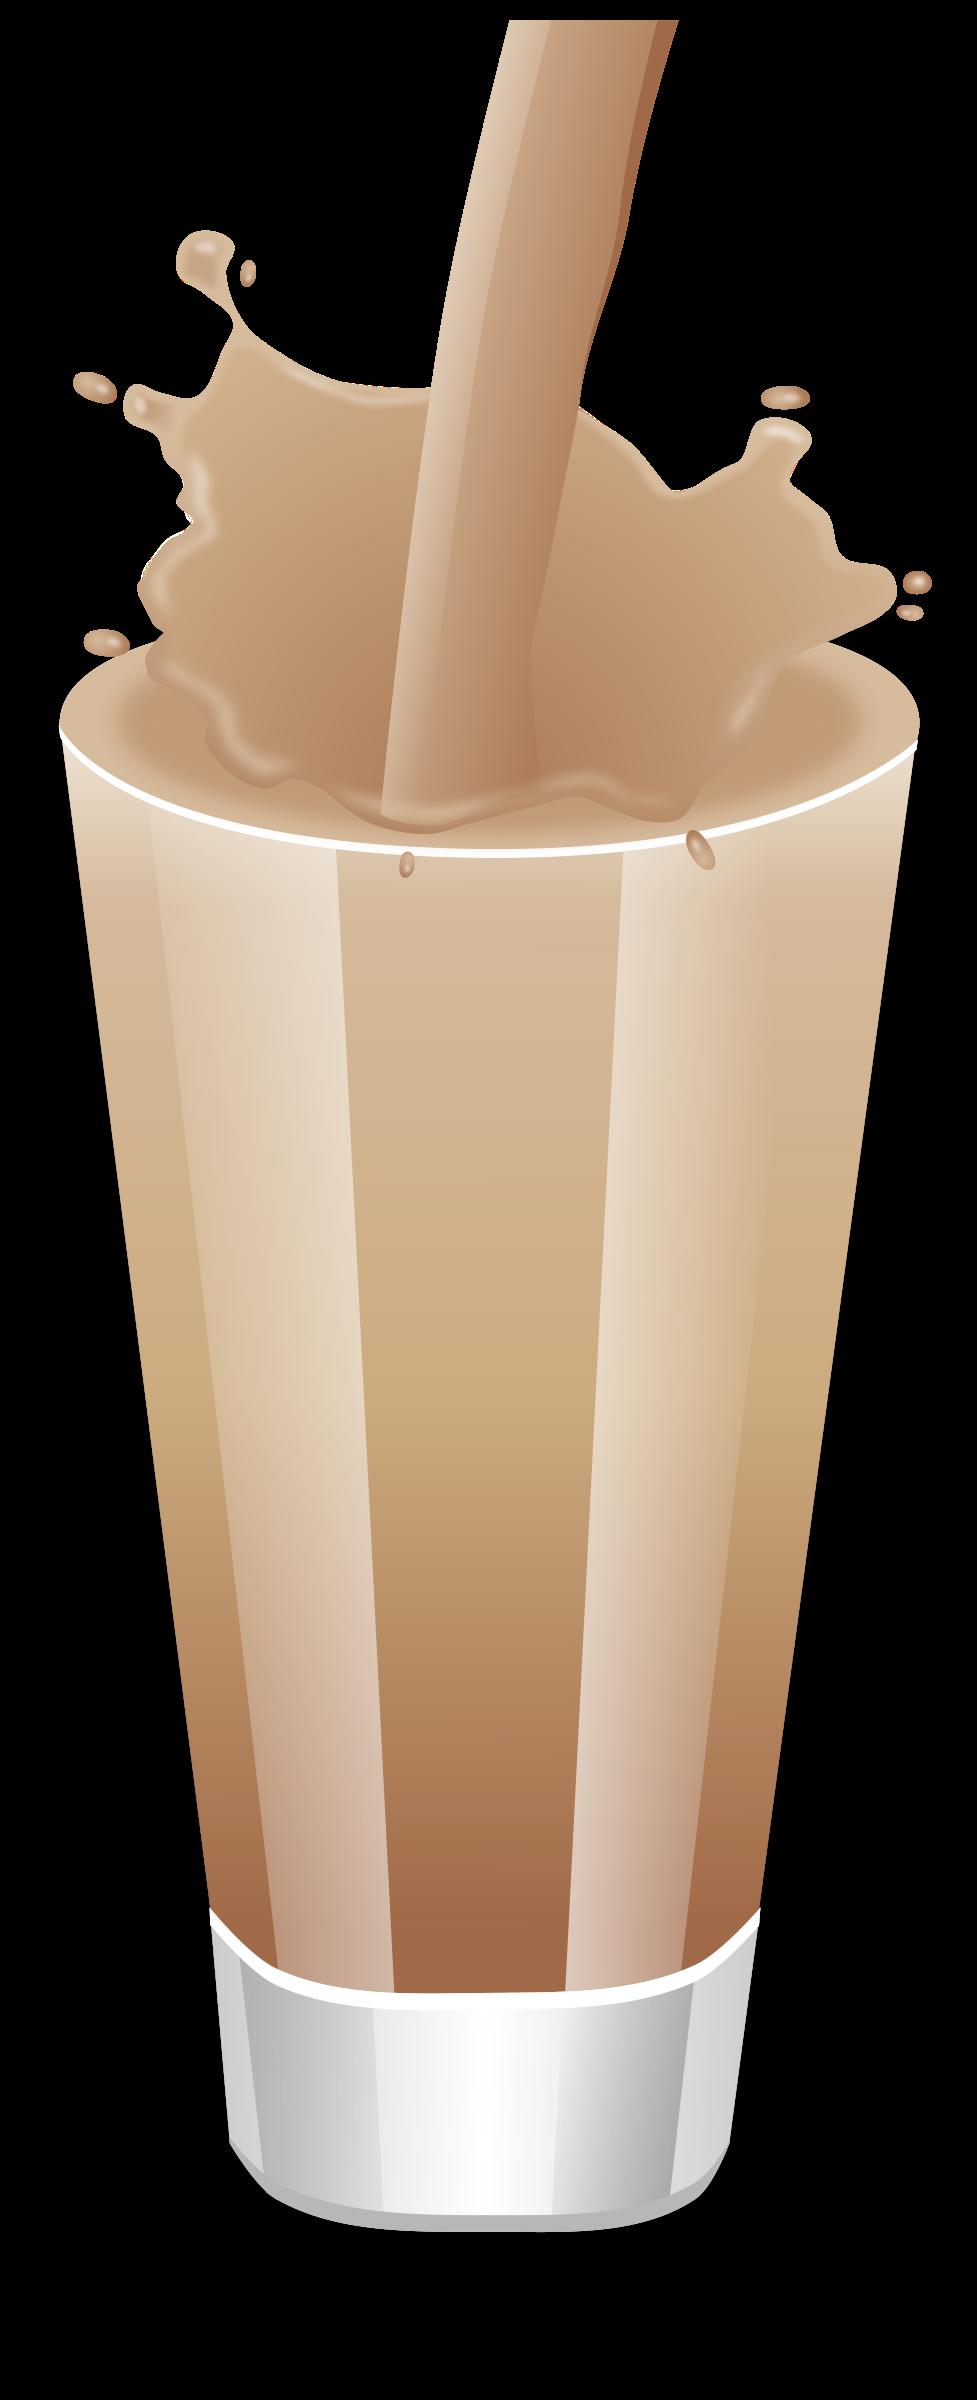 Drinks clipart milkshake. Cocoa big image png